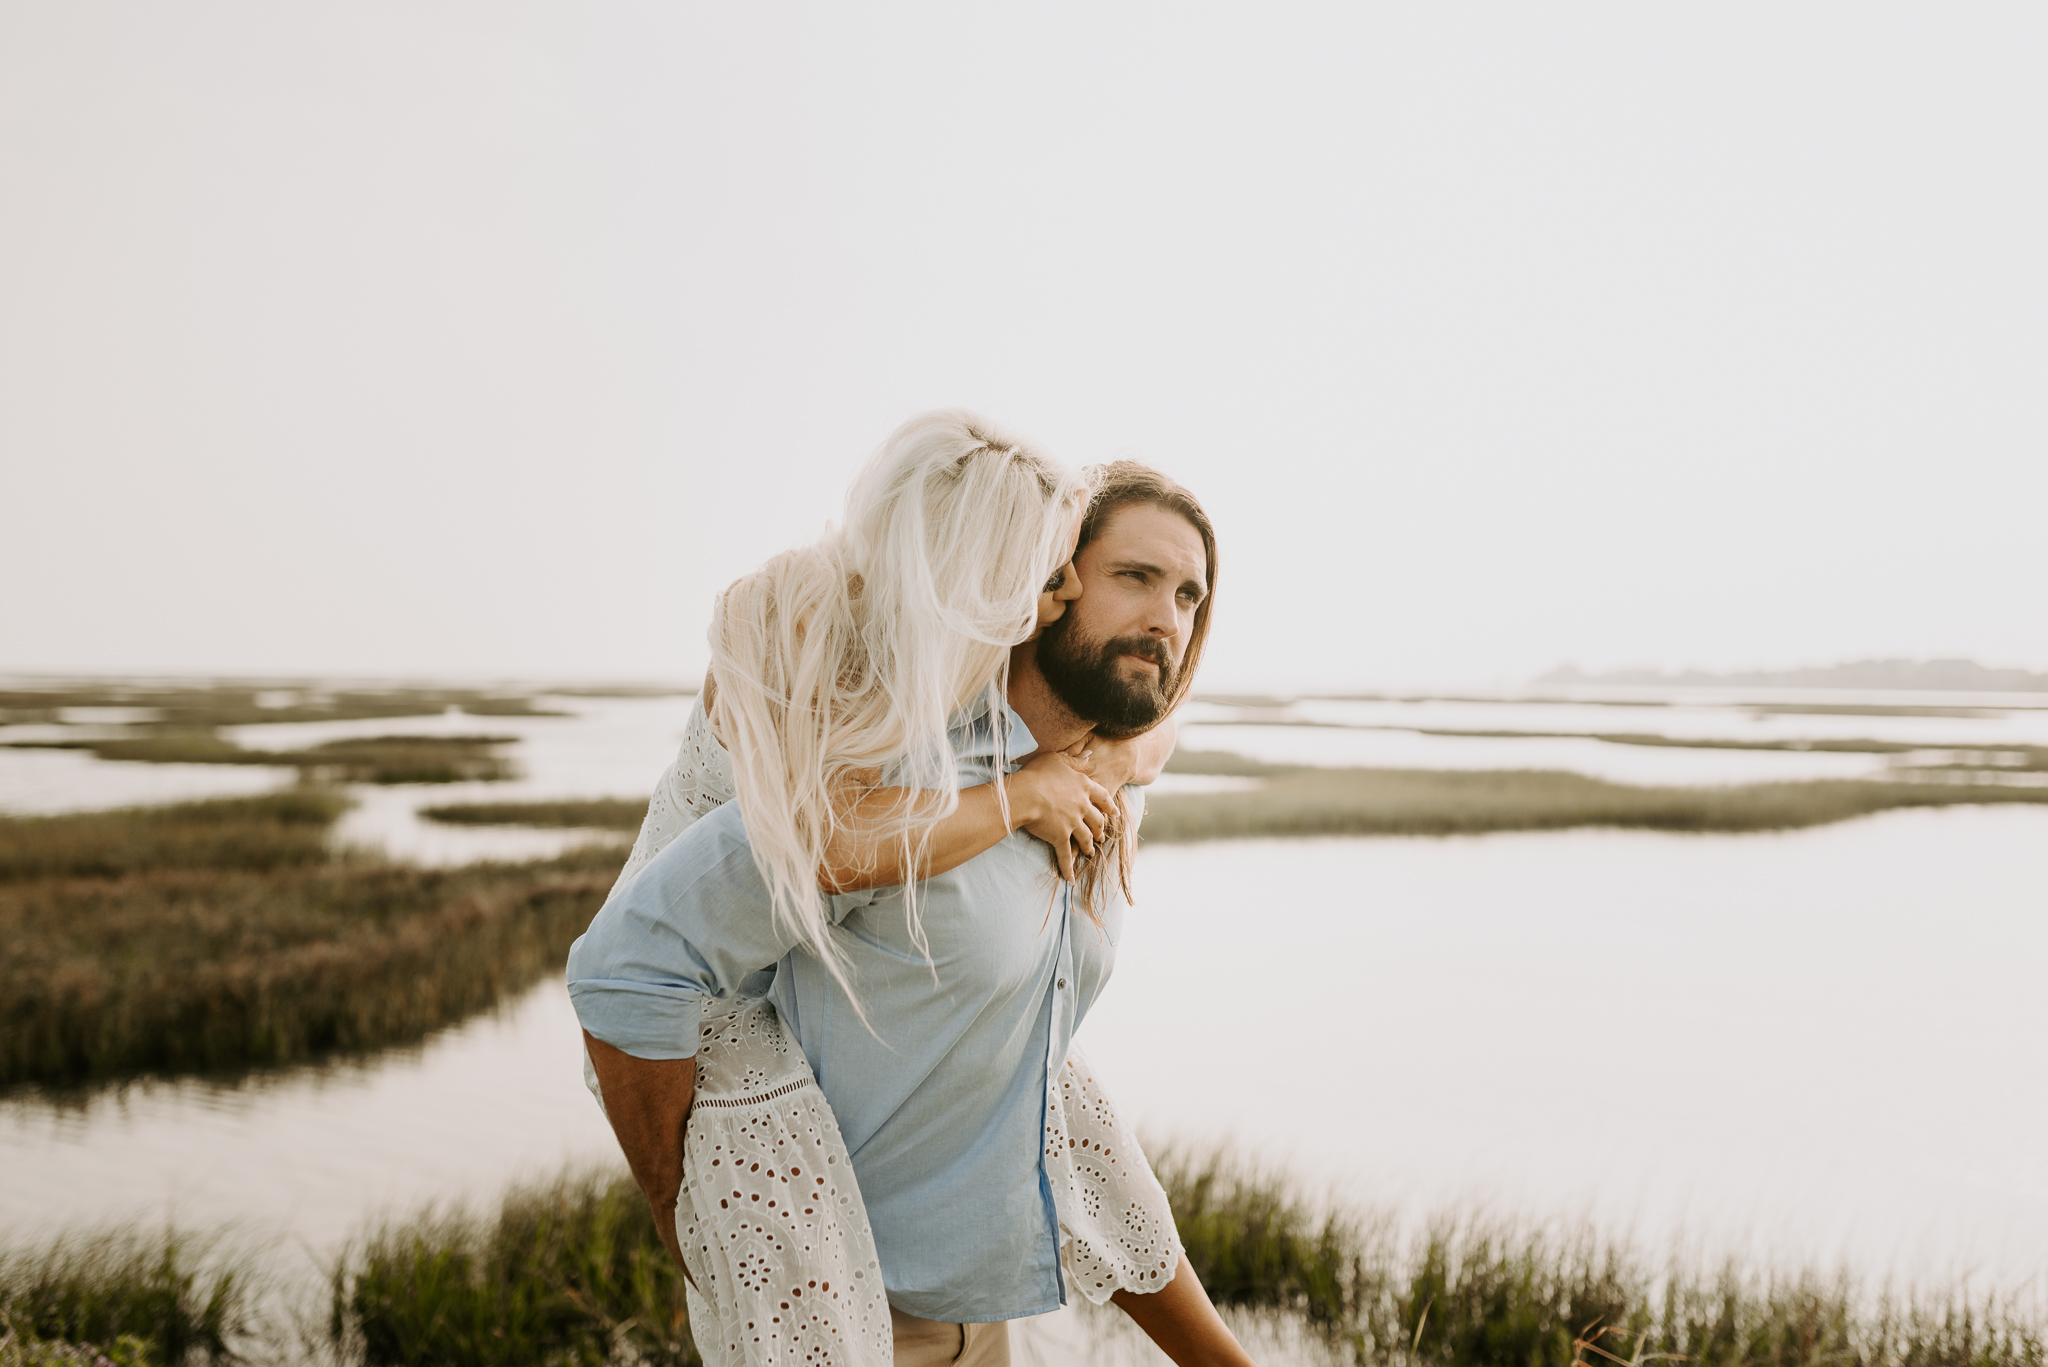 Ashley + Charles - Galveston Texas Moody Engagement Session | Kristen Giles Photography - 013.jpg